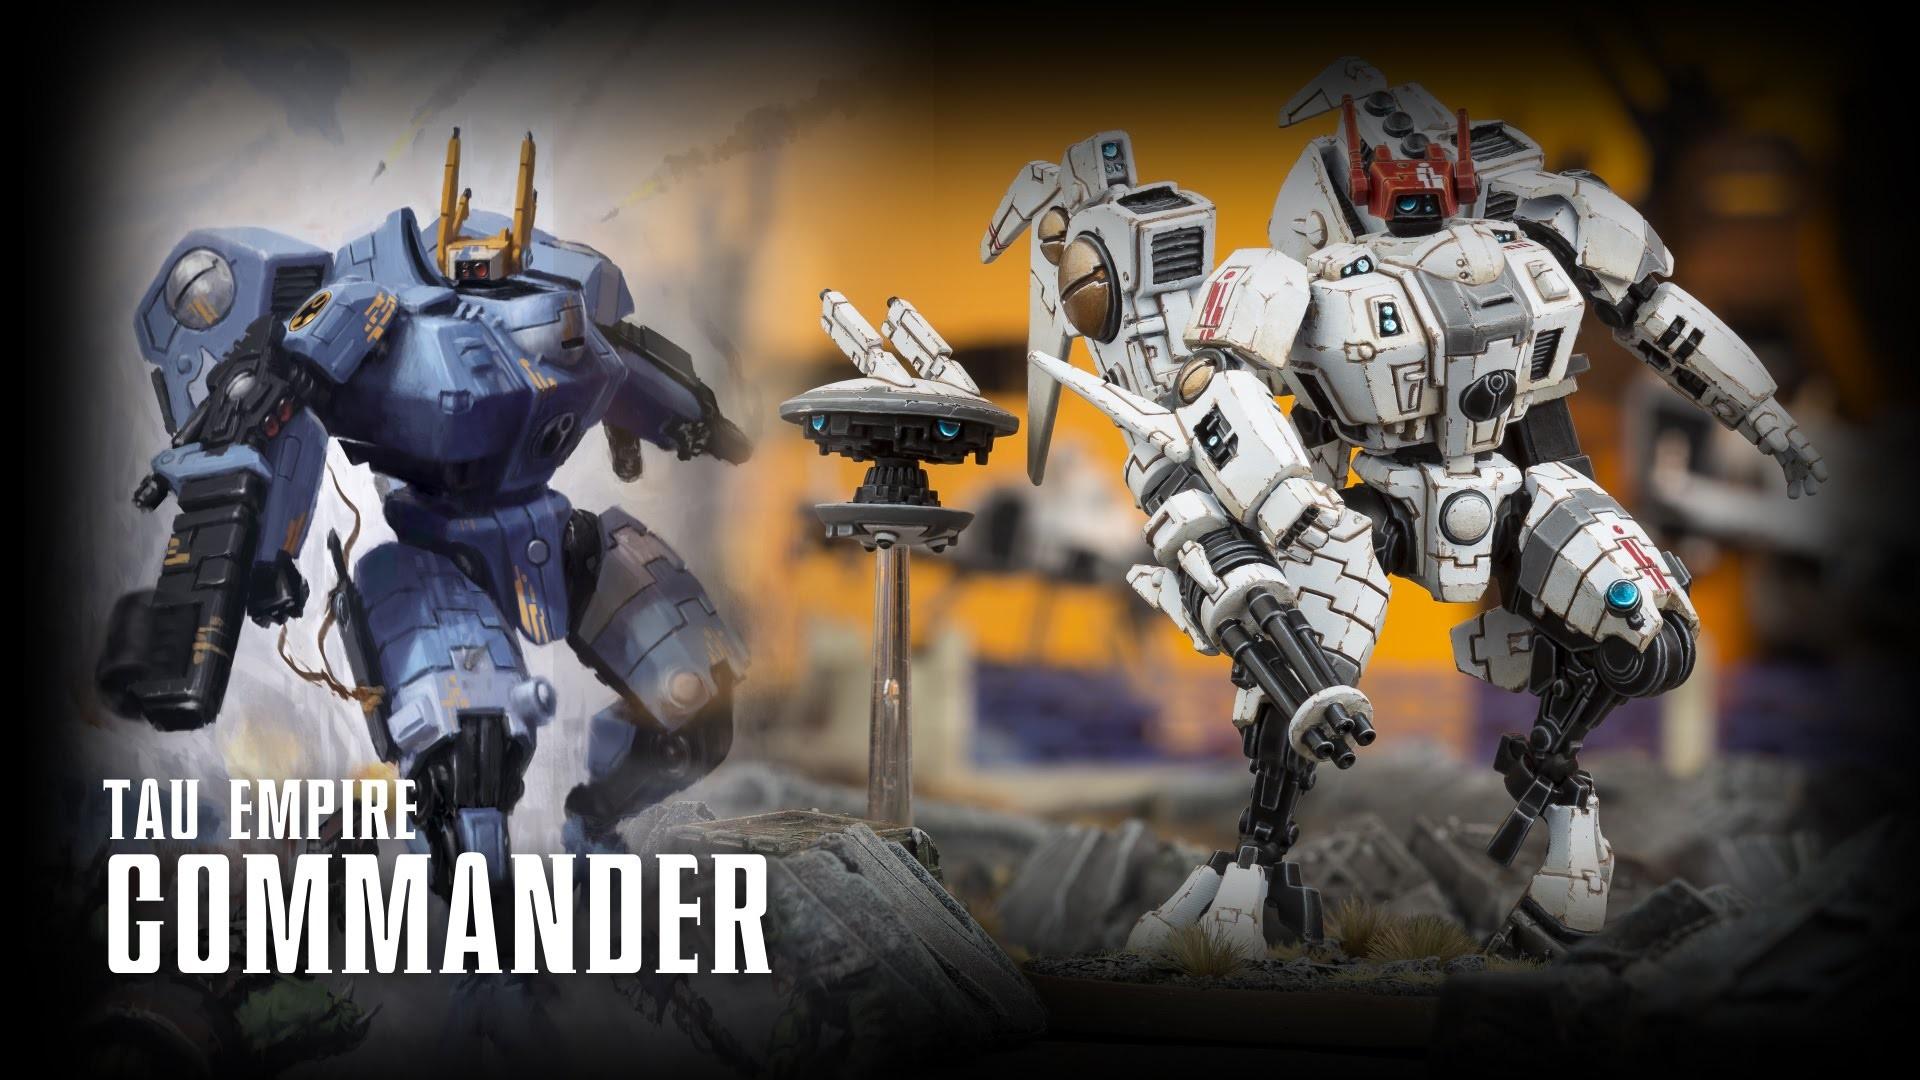 Warhammer 40,000: Tau Empire – Commander, XV8's & Codex